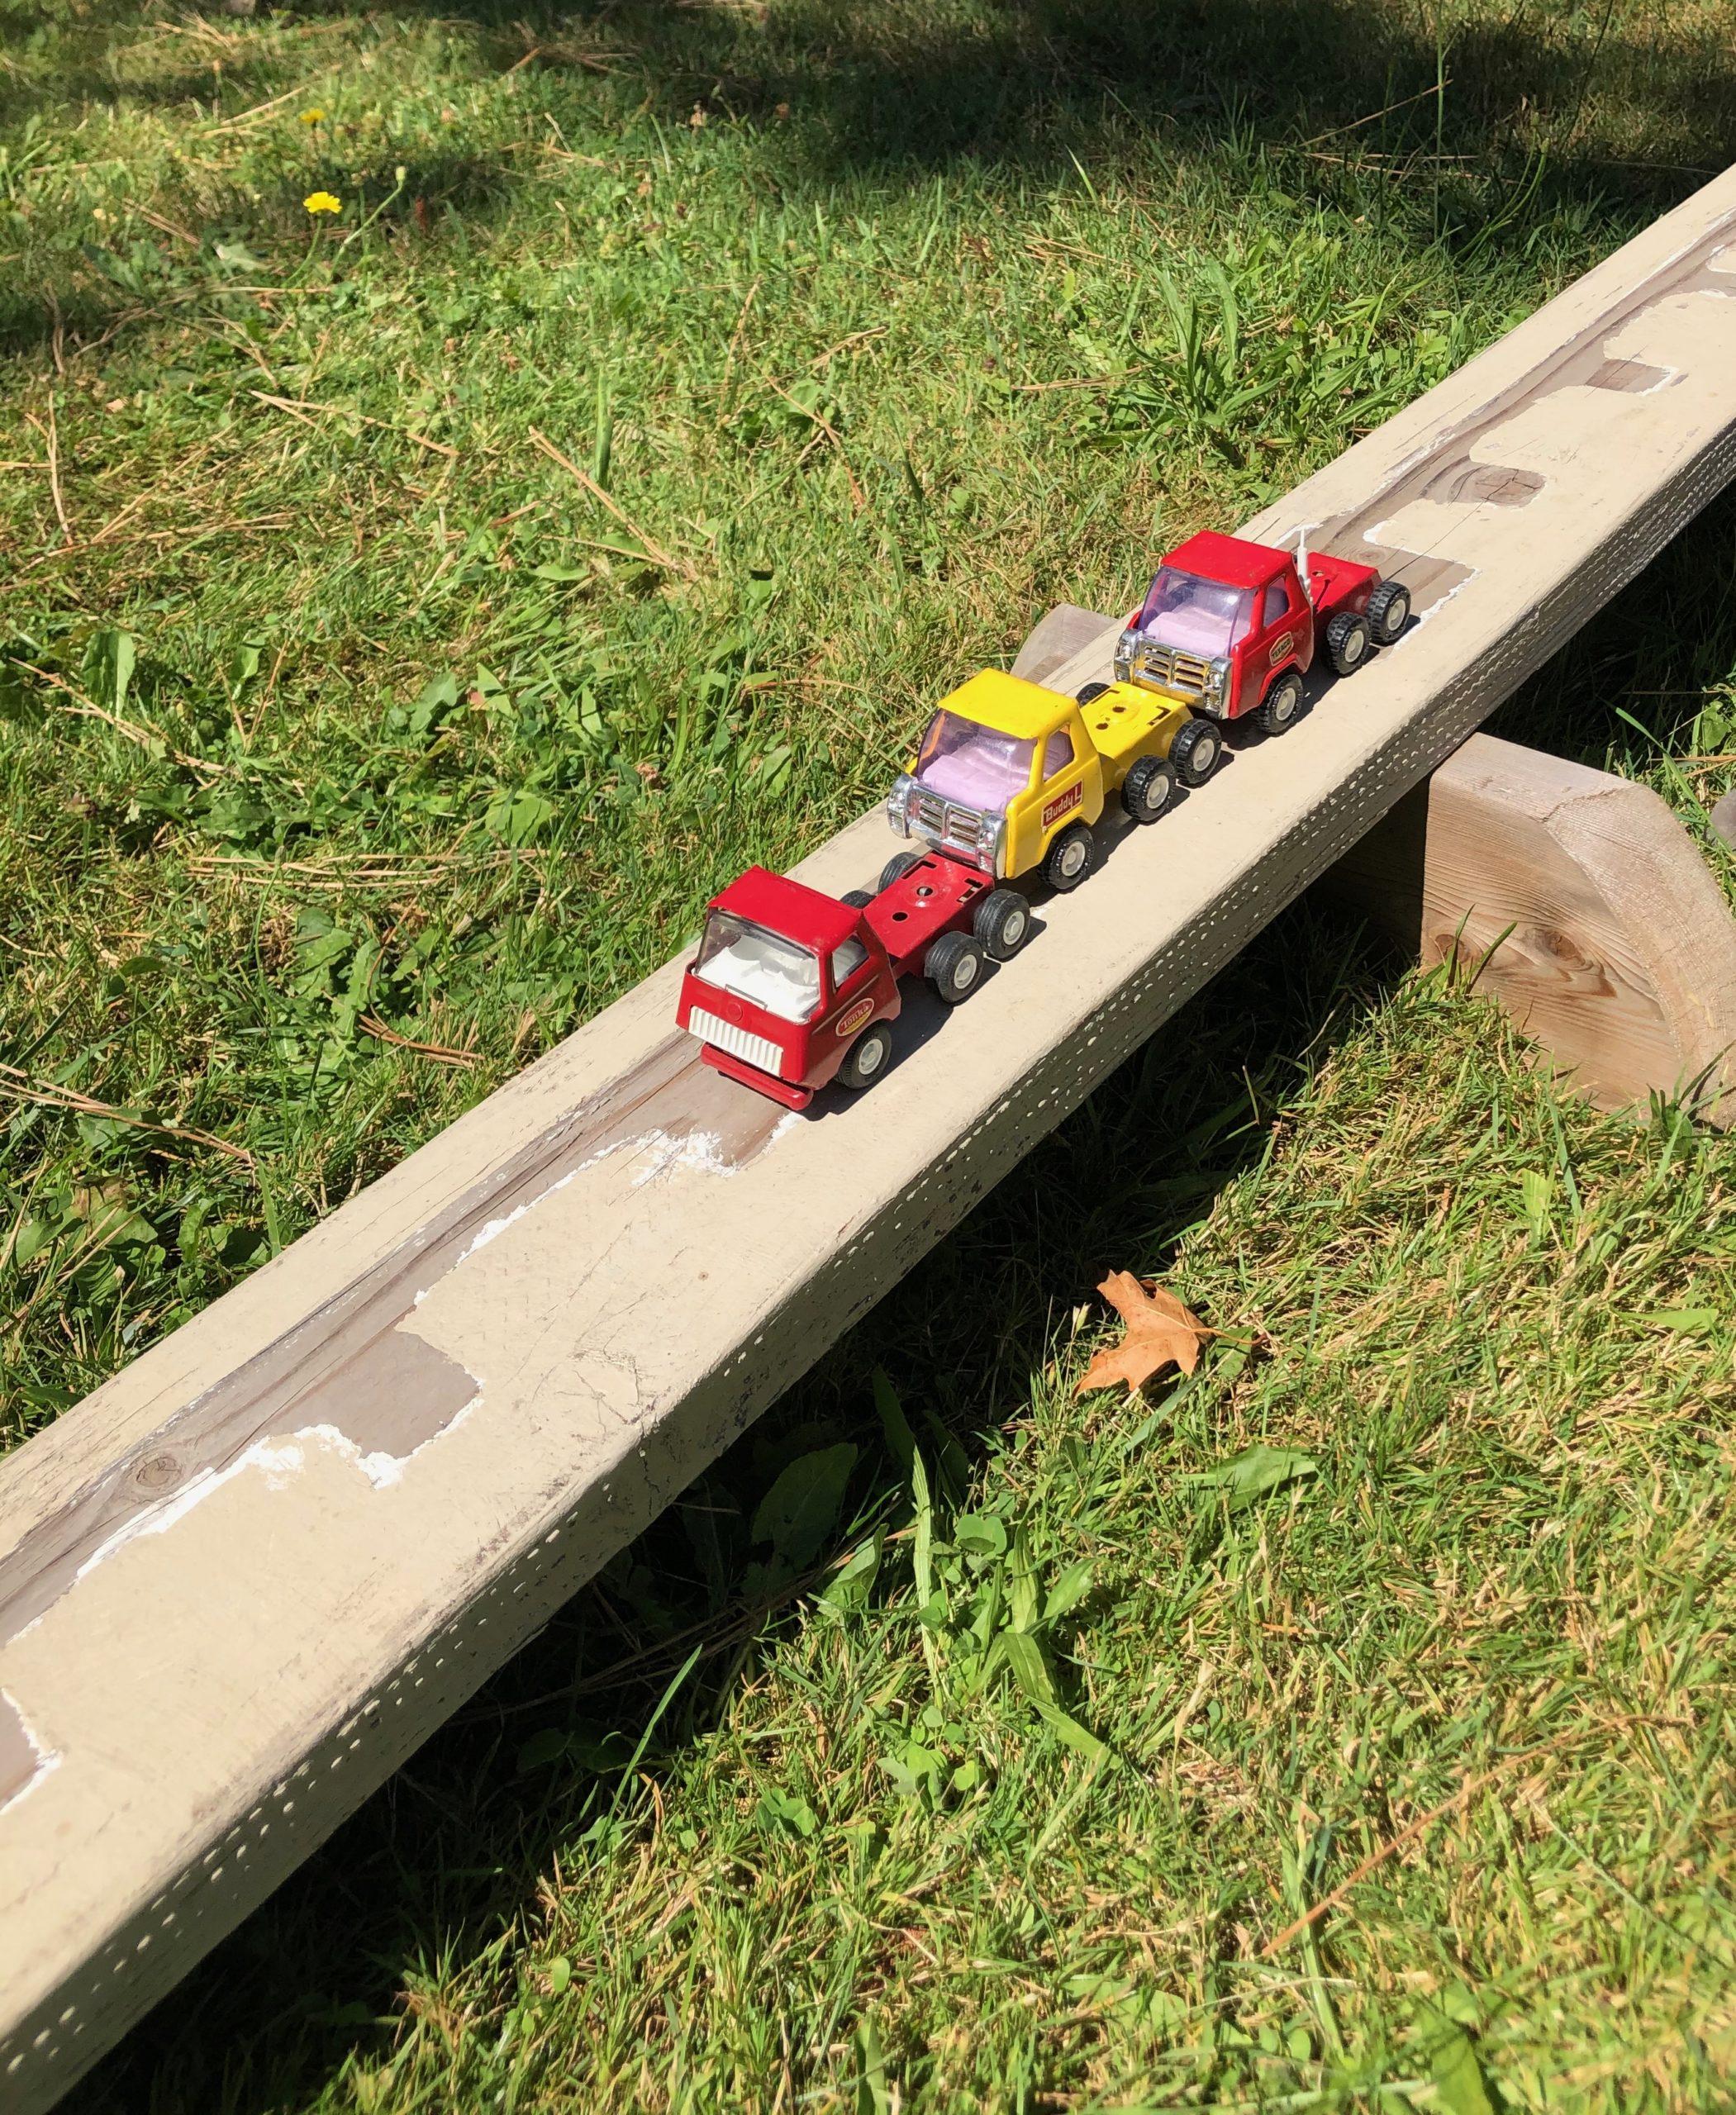 Toy truck ramp